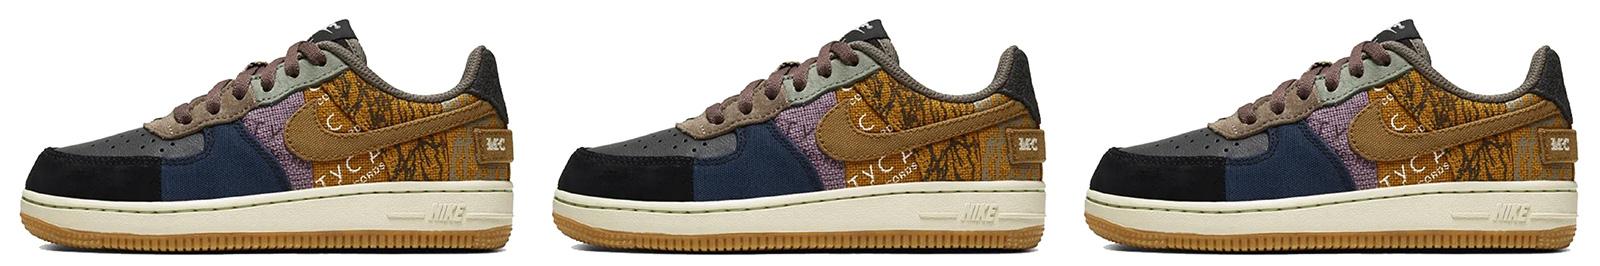 Nike Air Force 1 x Cactus Jack